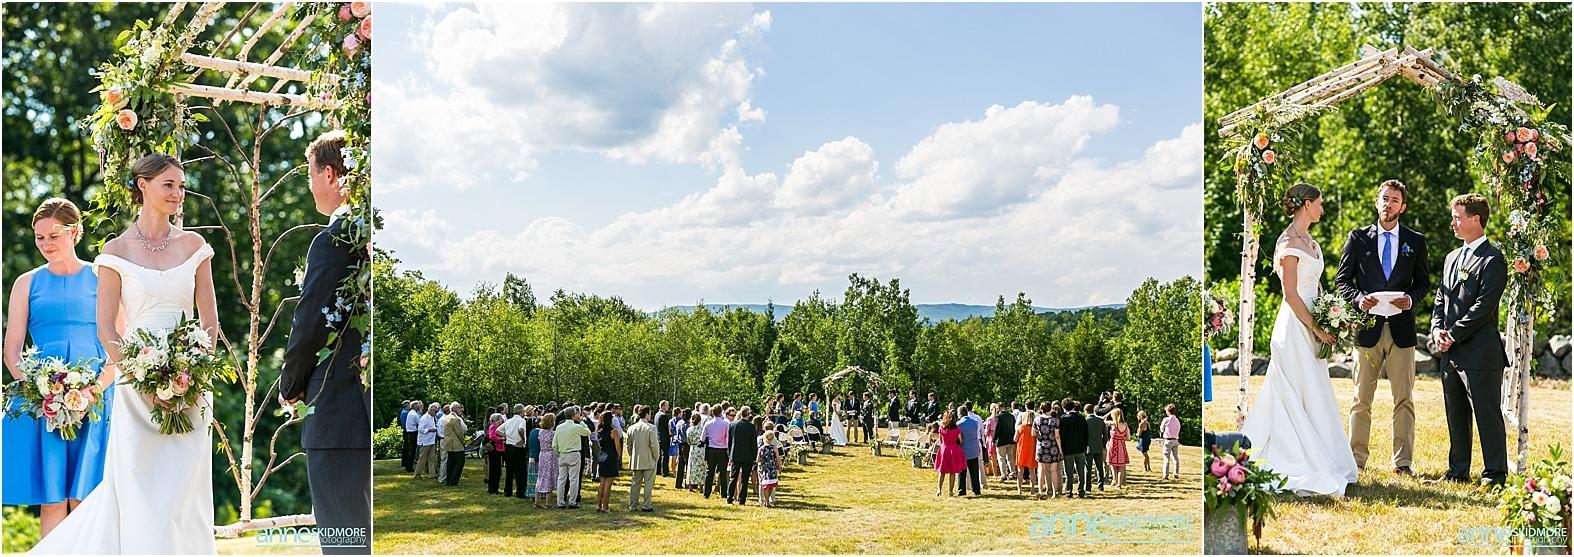 new_hampshire_wedding_photography_0038